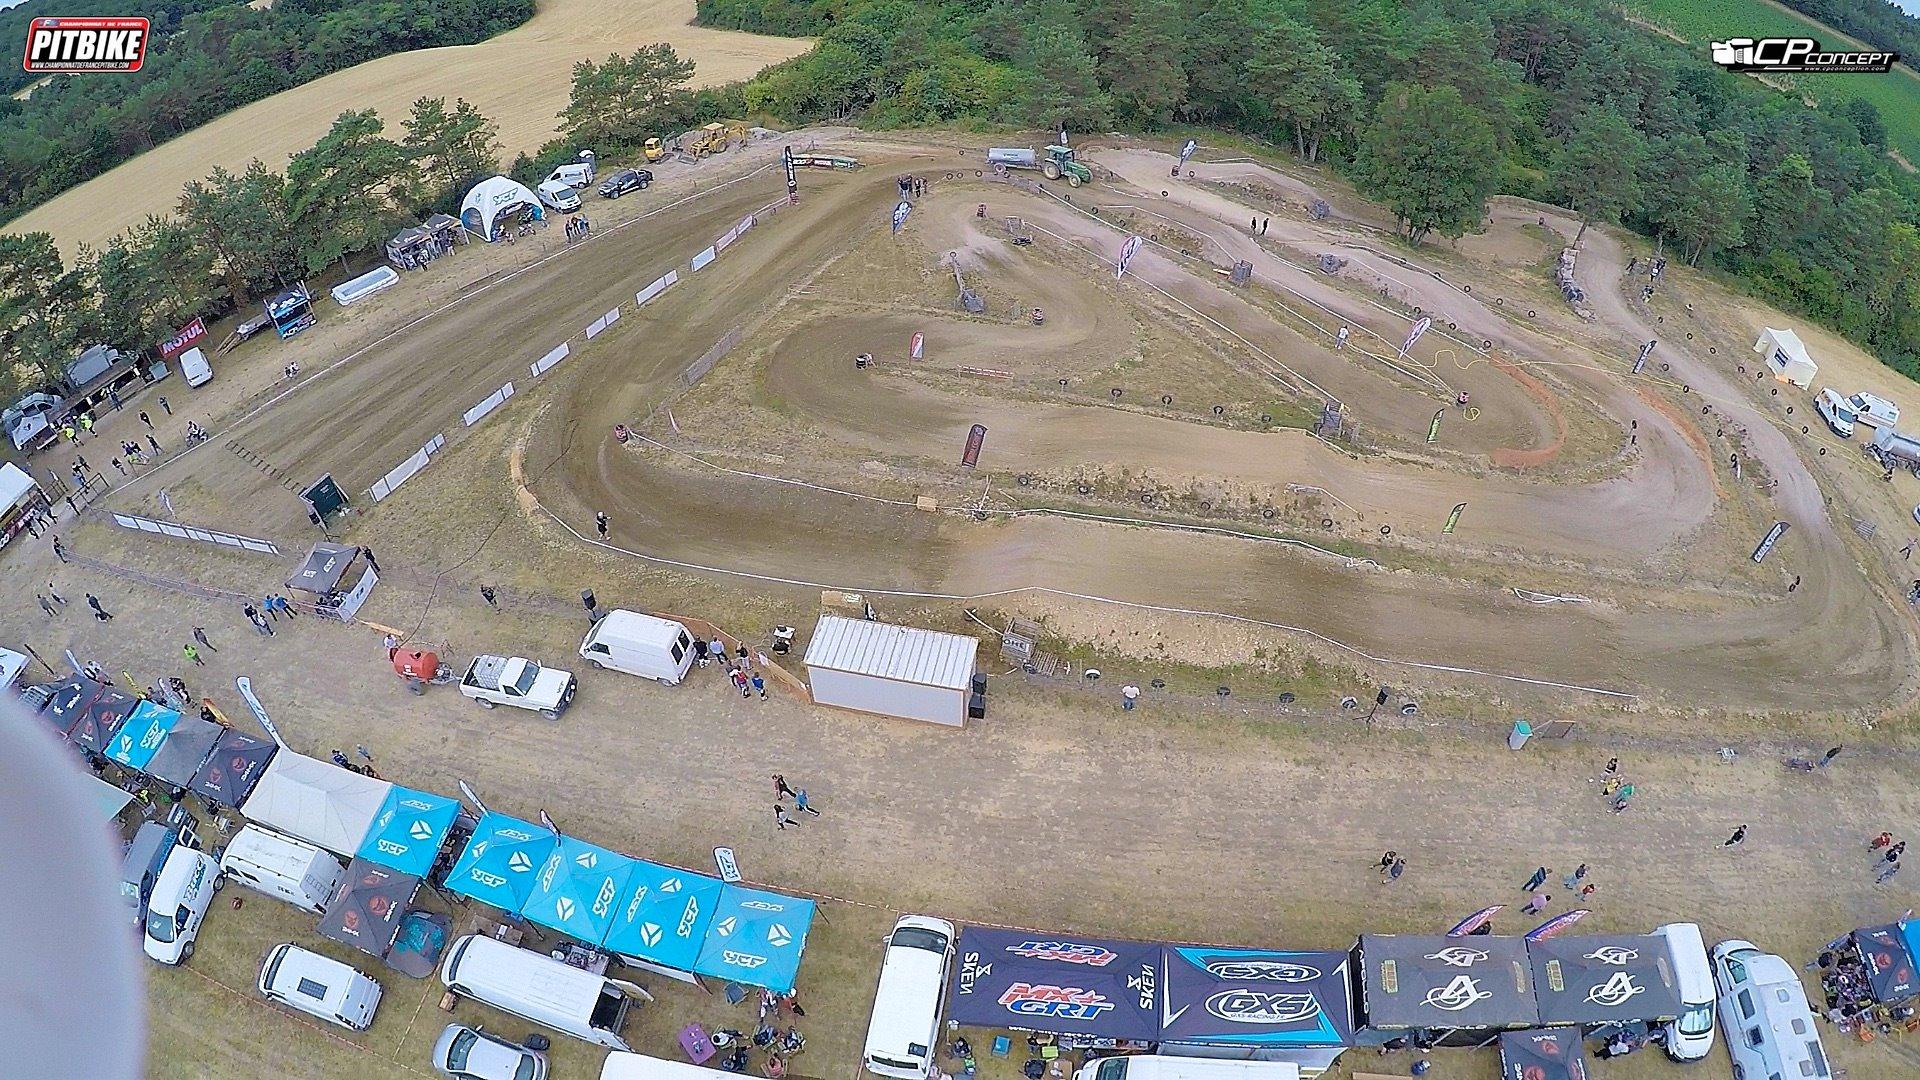 circuit loches terrain pit bike